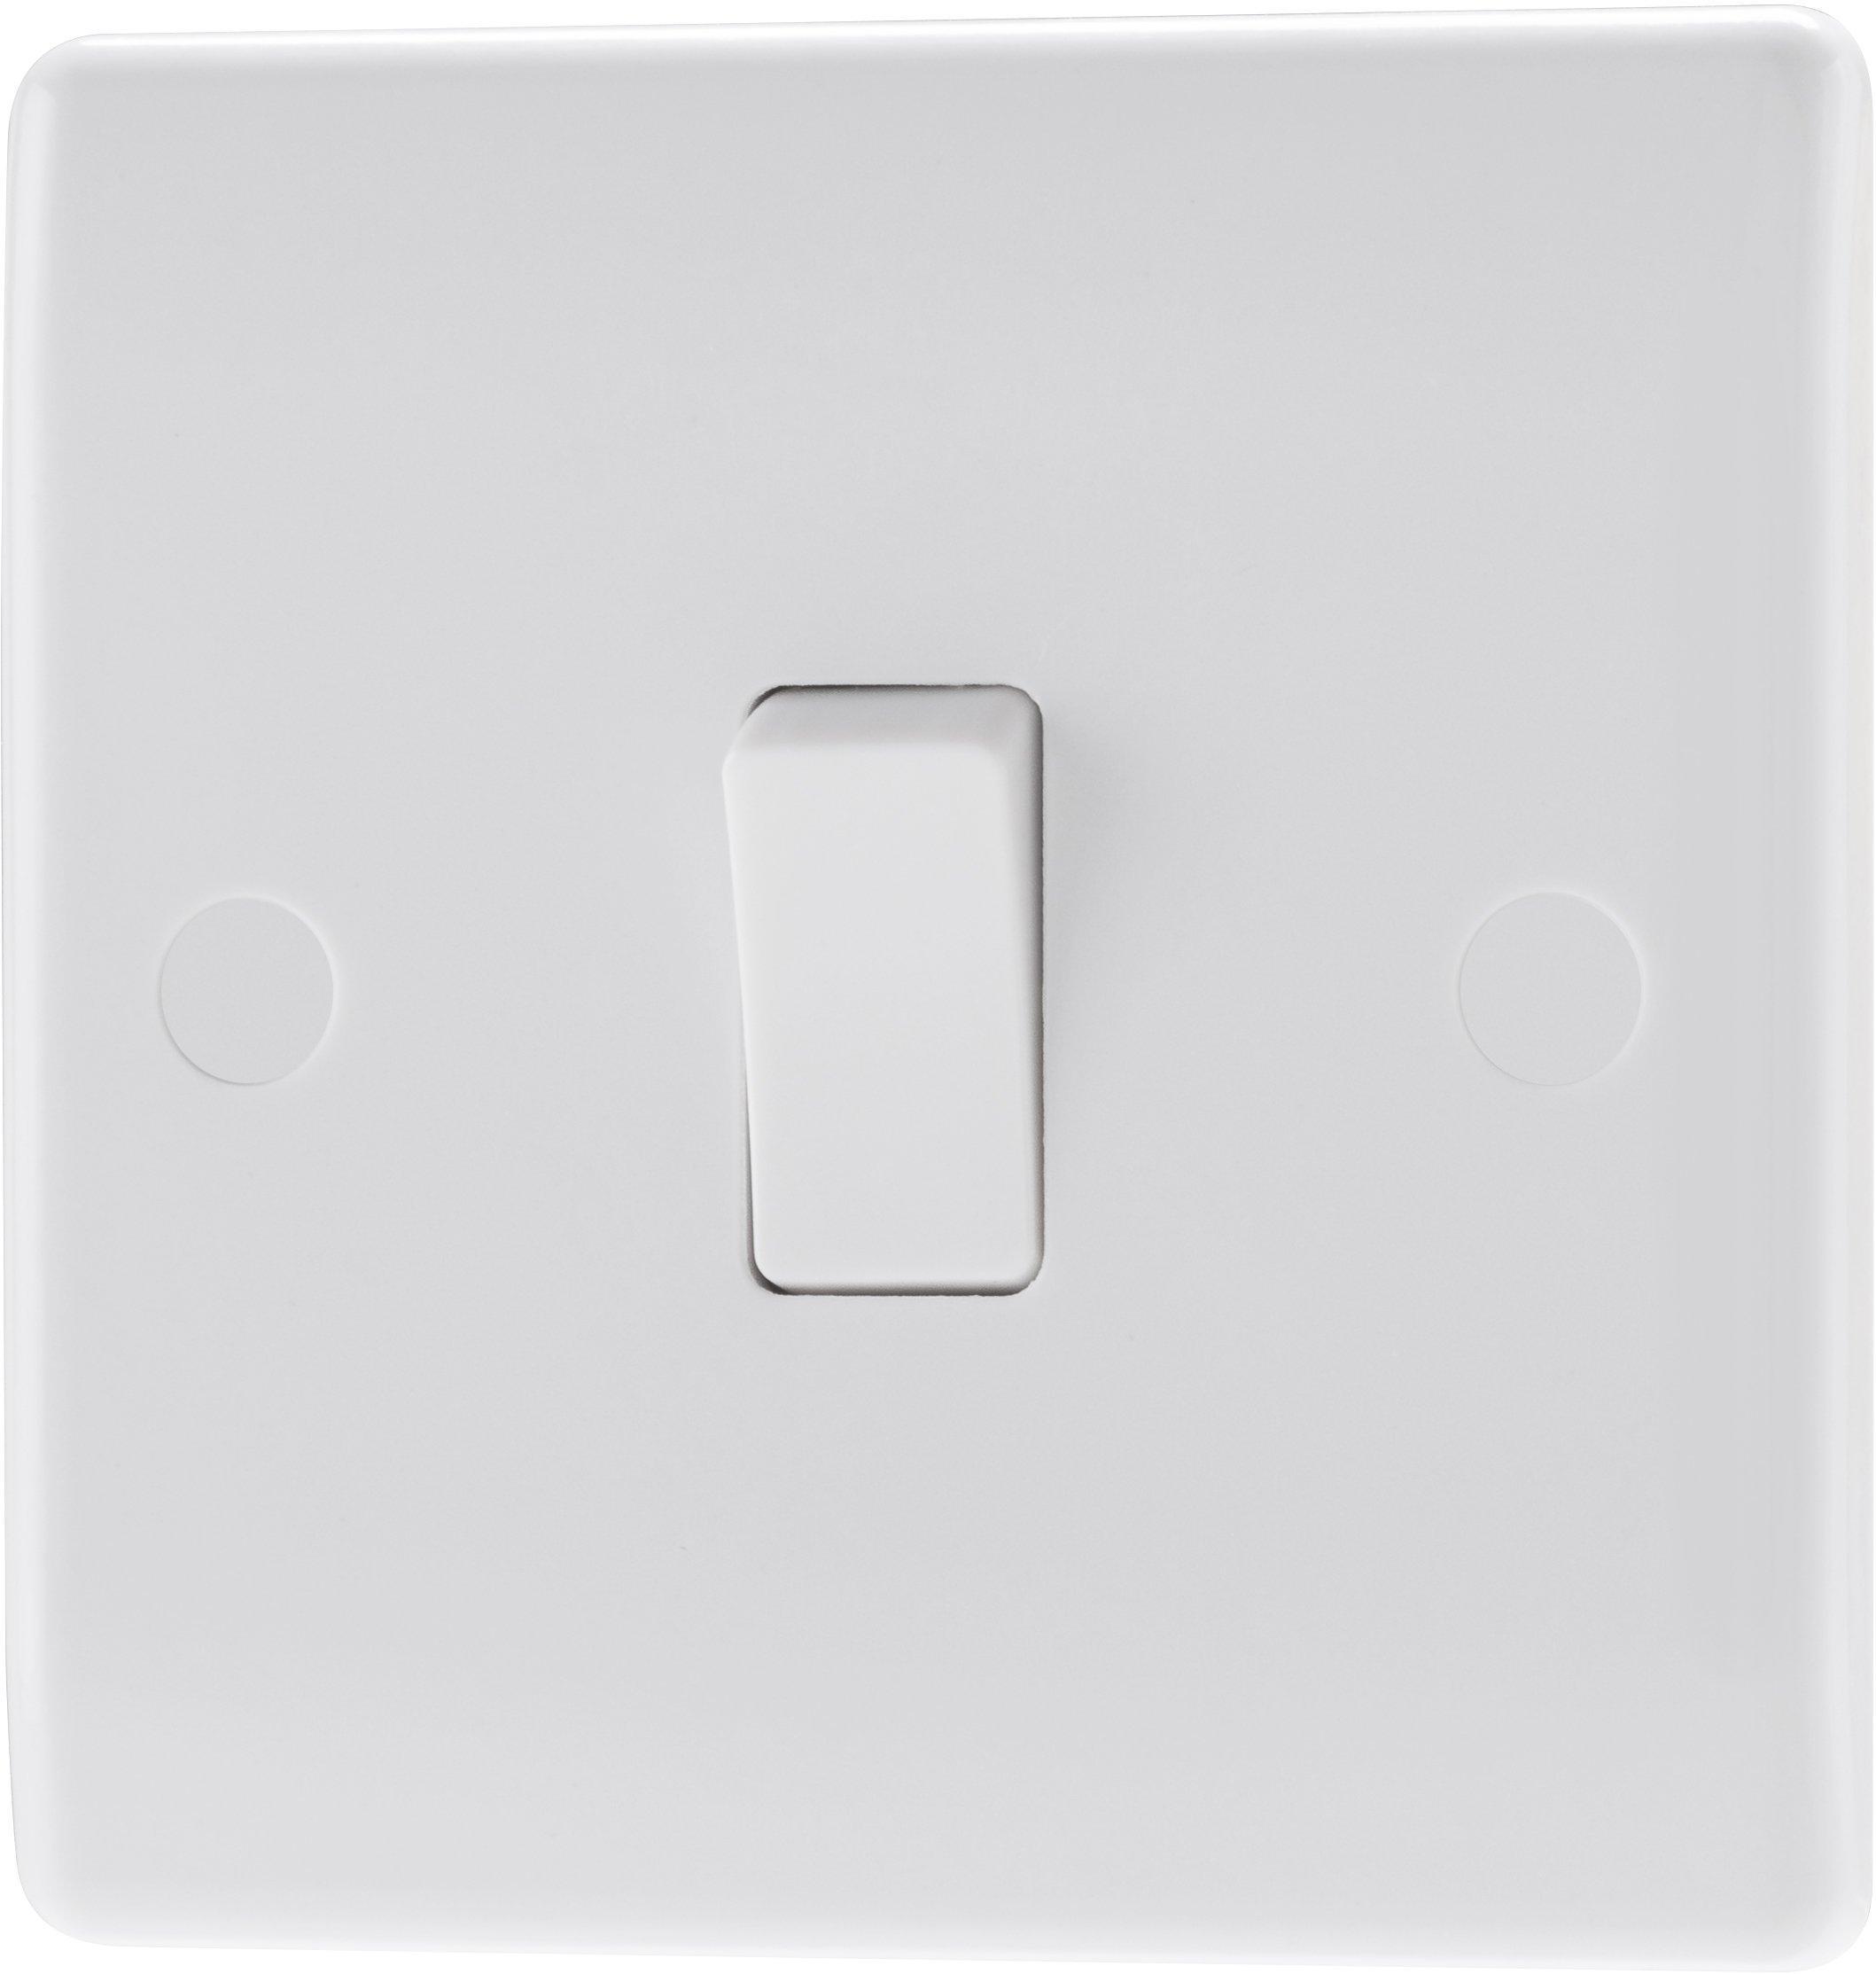 Single 2 Way Switch: Amazon.co.uk